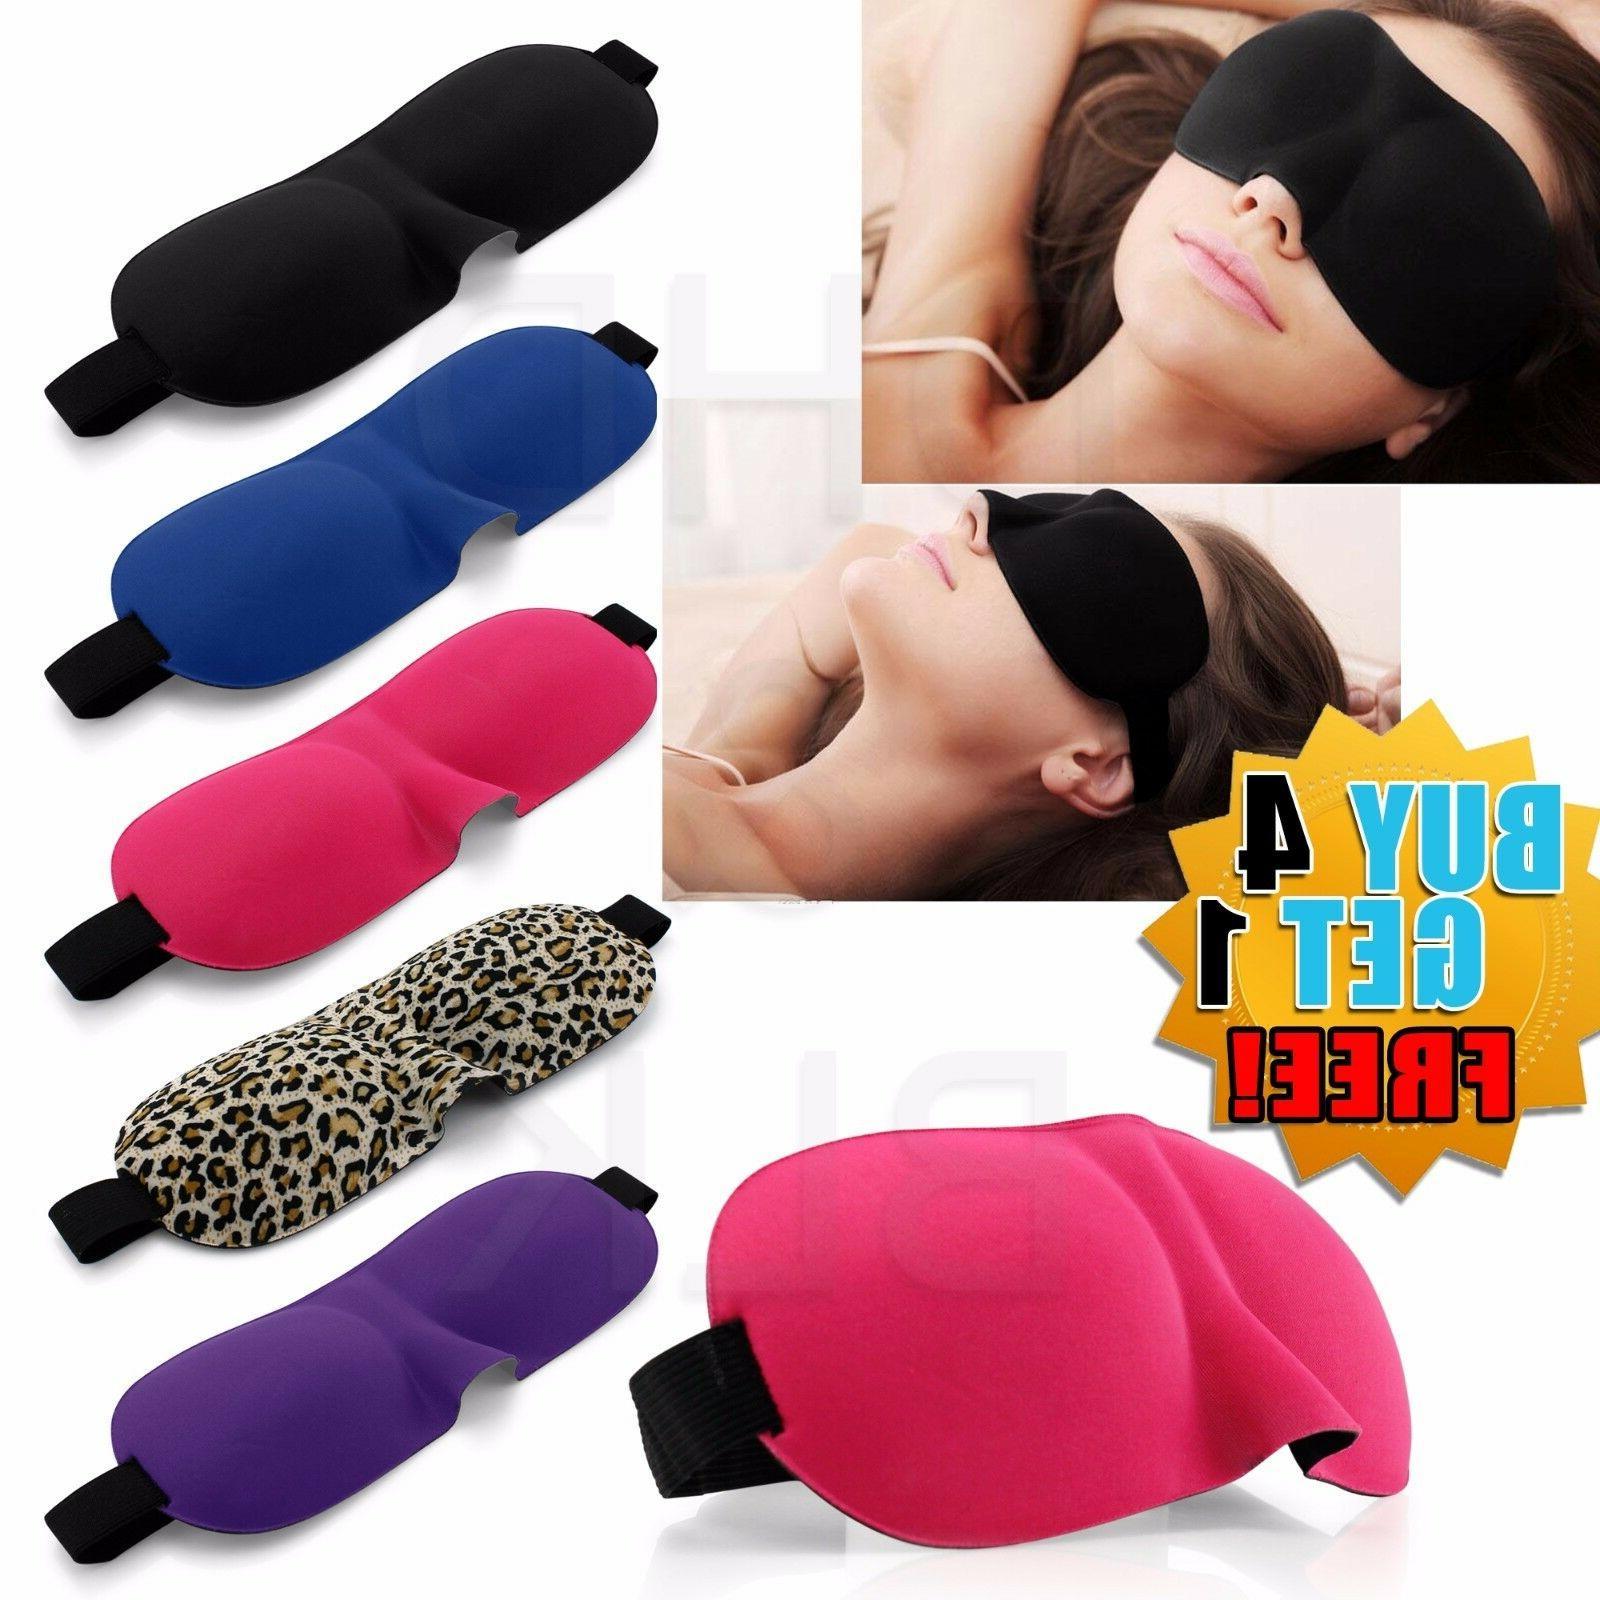 travel 3d eye mask sleep soft padded